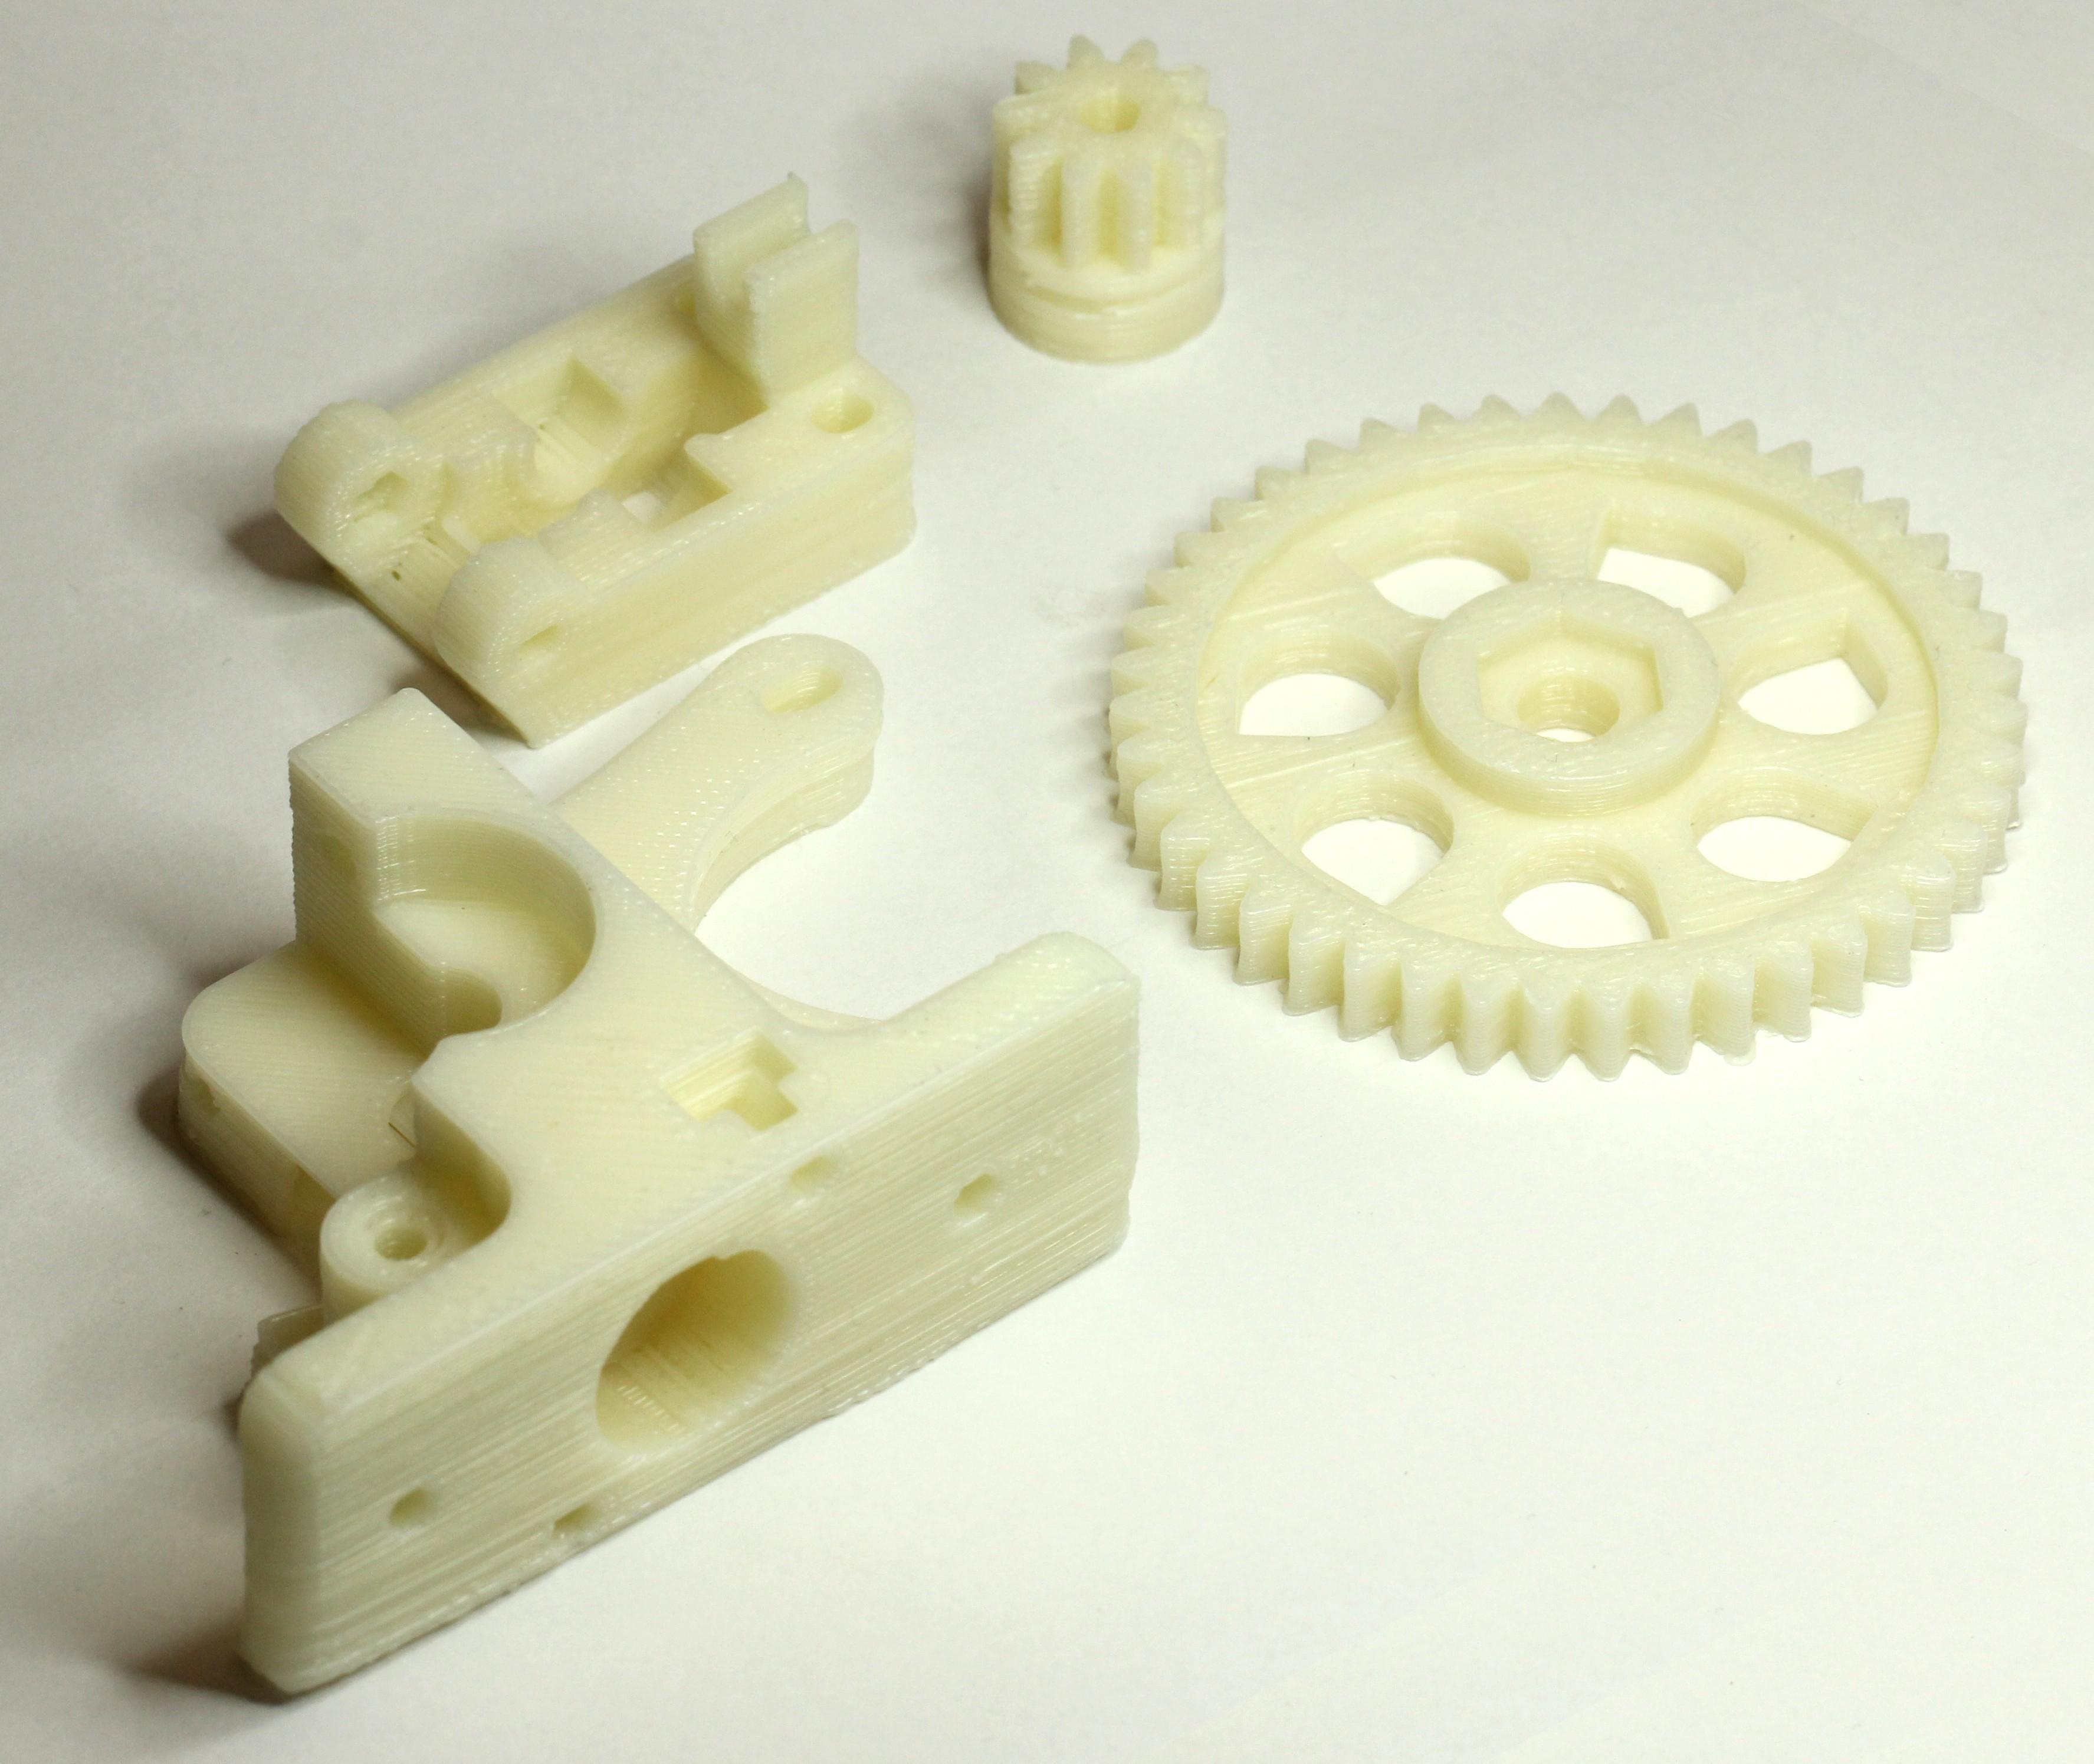 Greg s extruder cold end printed parts v5 (ABS, 3mm filament)